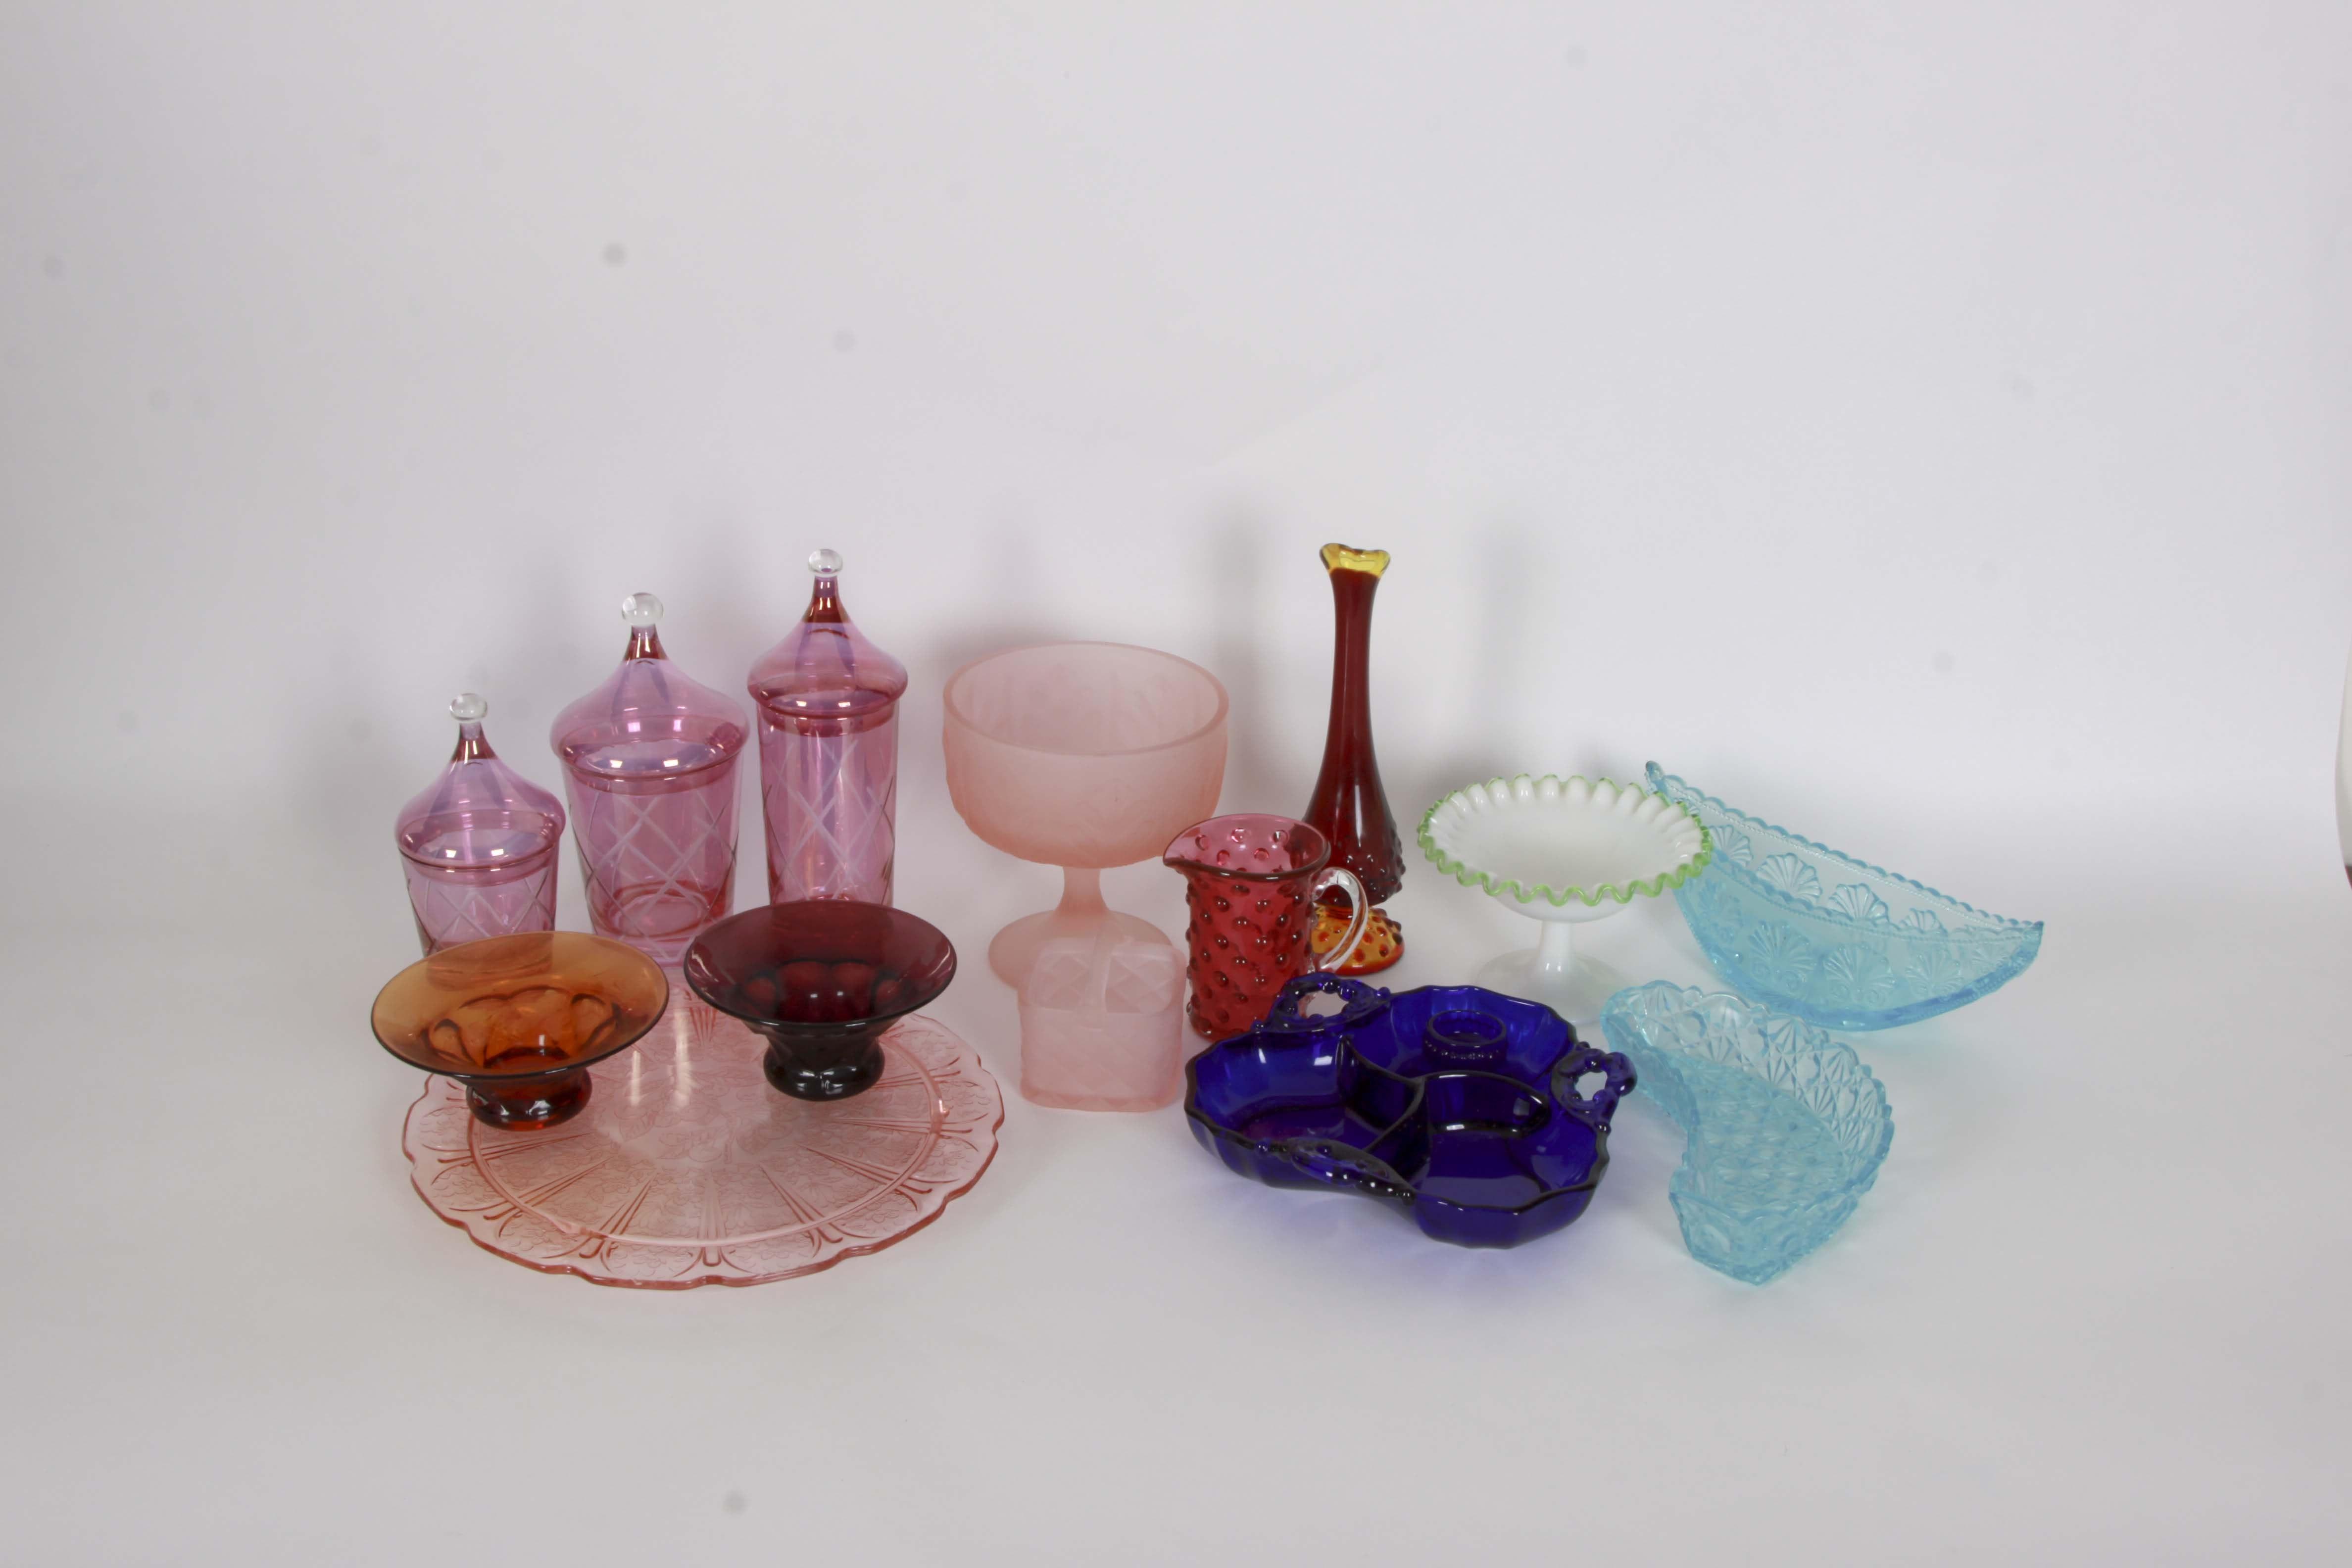 Vintage Glass Decor Assortment